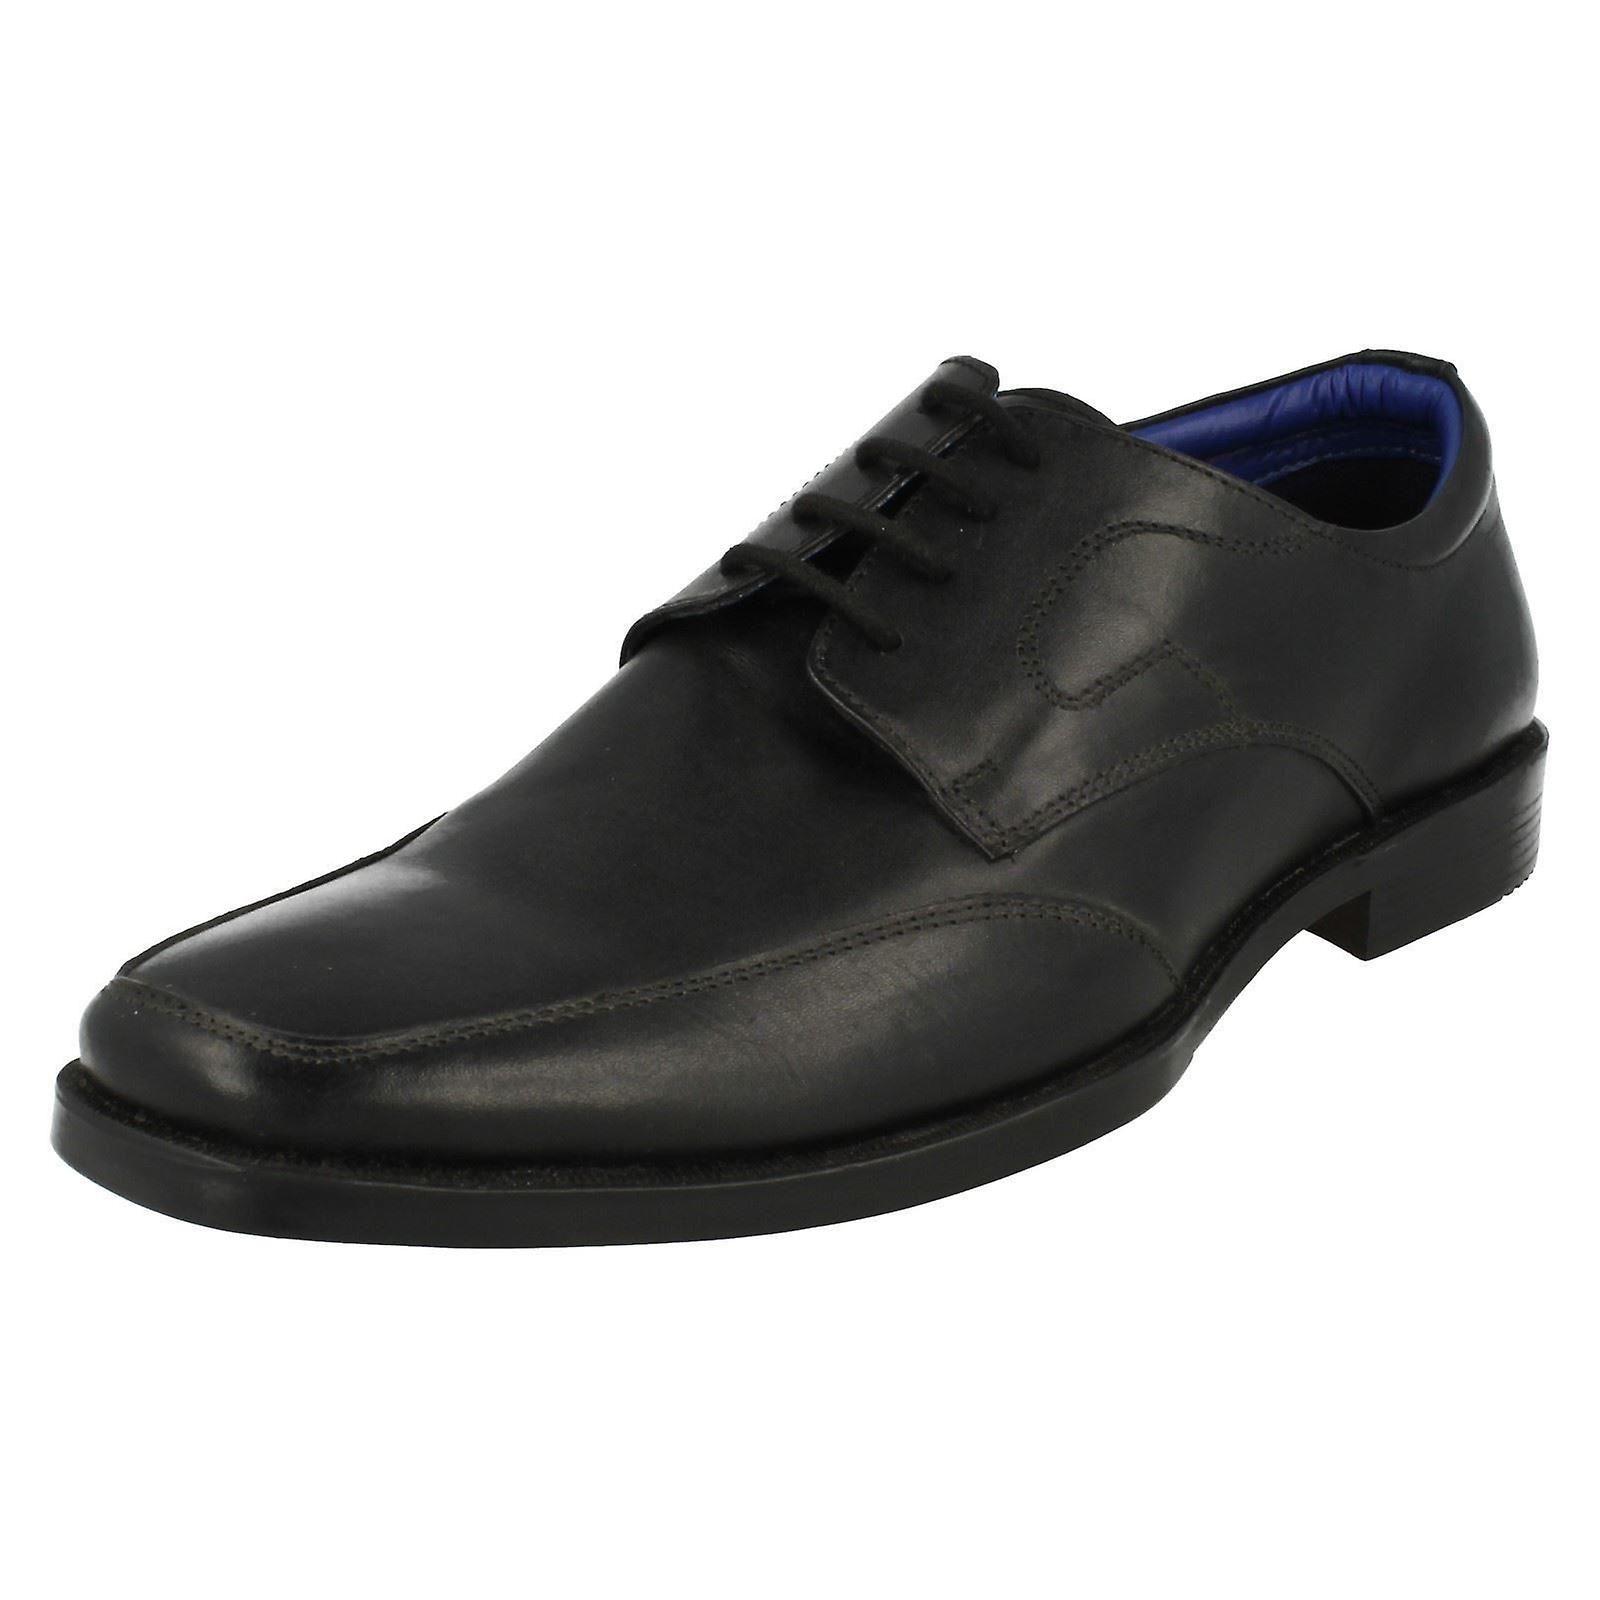 fca6bfbf286416 Mens PSL formale Lace Up Schuhe PS486 - 96b178 - stadtplan-glinde.de